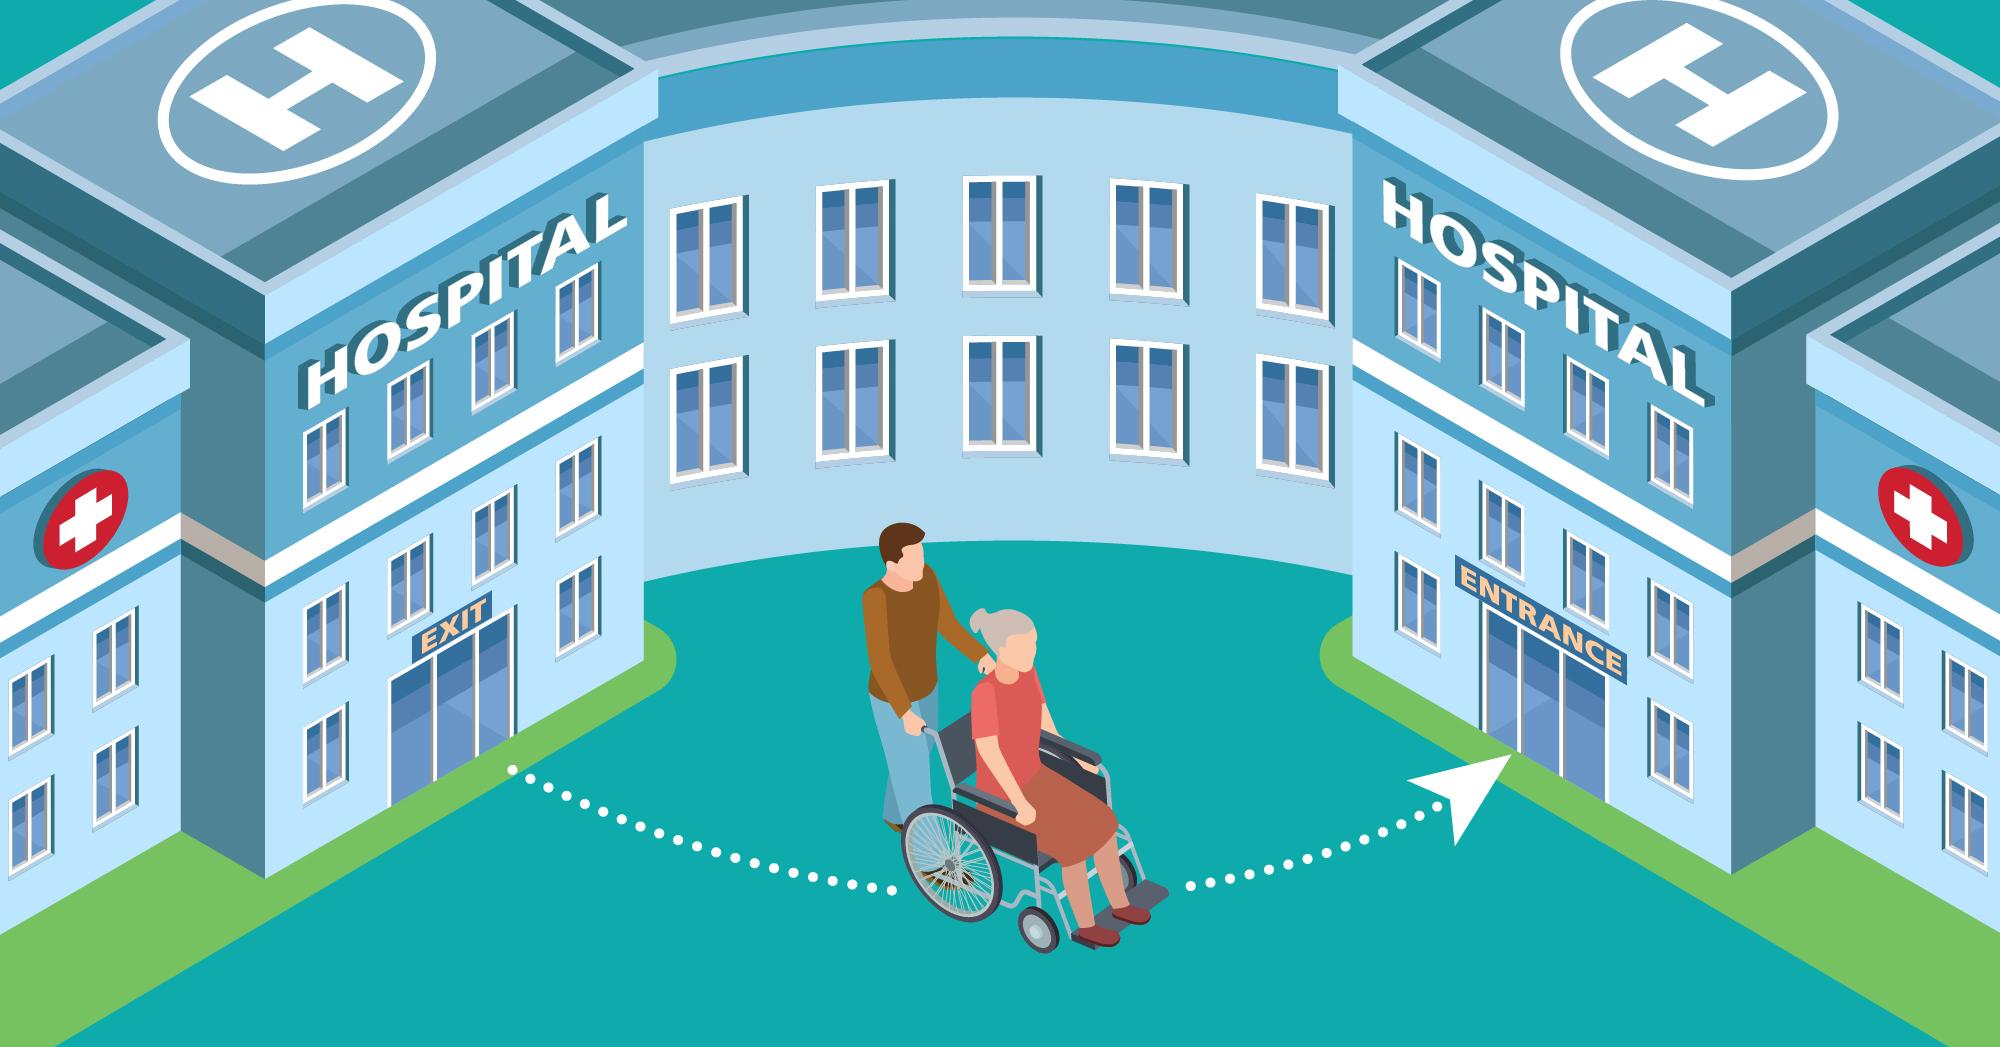 Reducing hospital readmission via home care